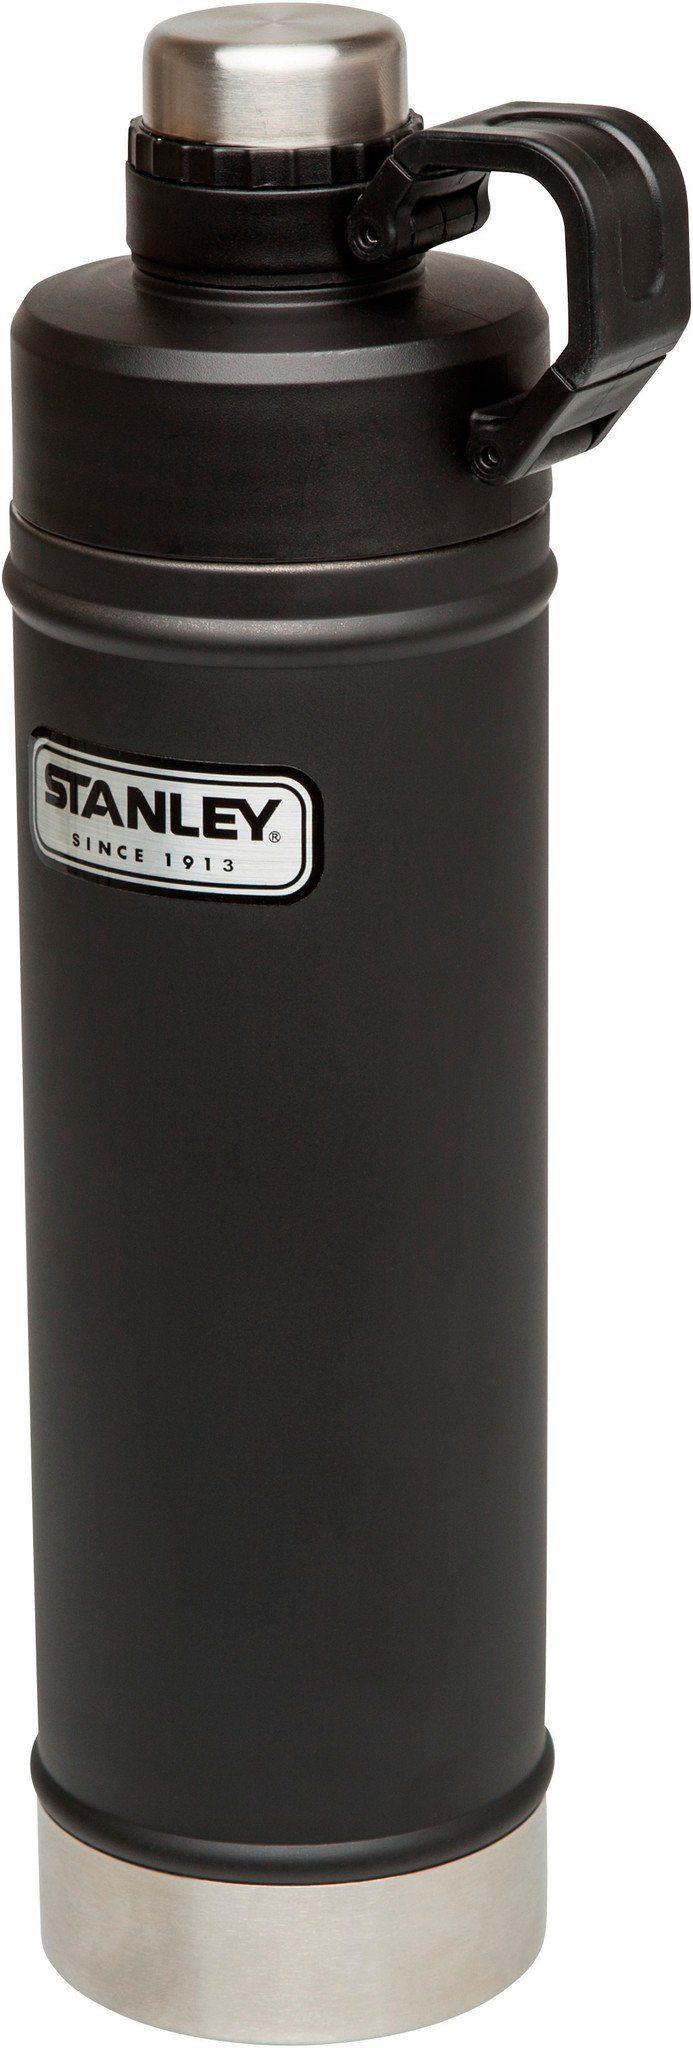 STANLEY Trinkflasche »Classic Vacuum Water Bottle 750ml«